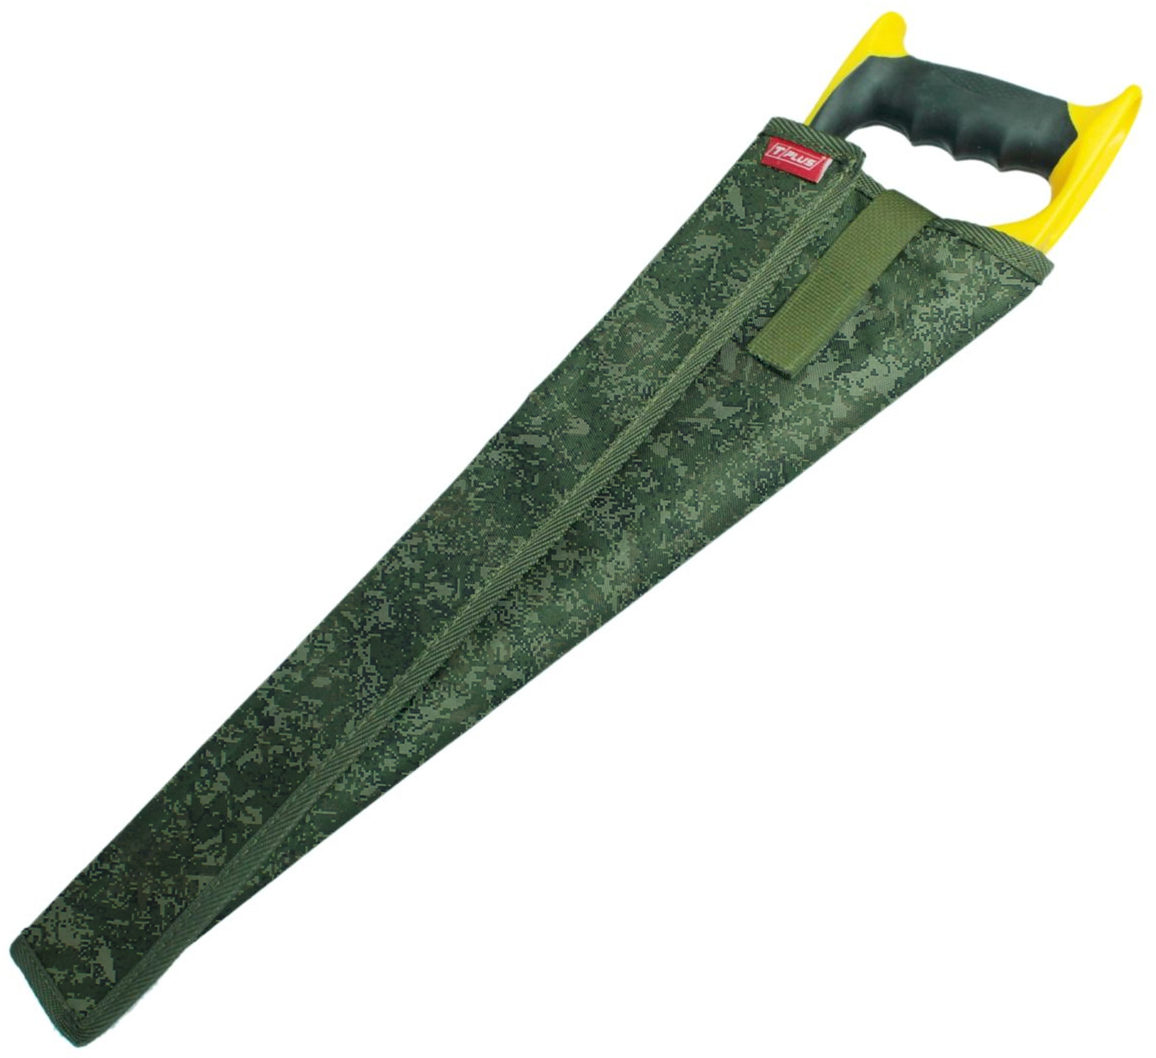 Чехол для ножовки Tplus, оксфорд 600, цвет: цифра, 50 см